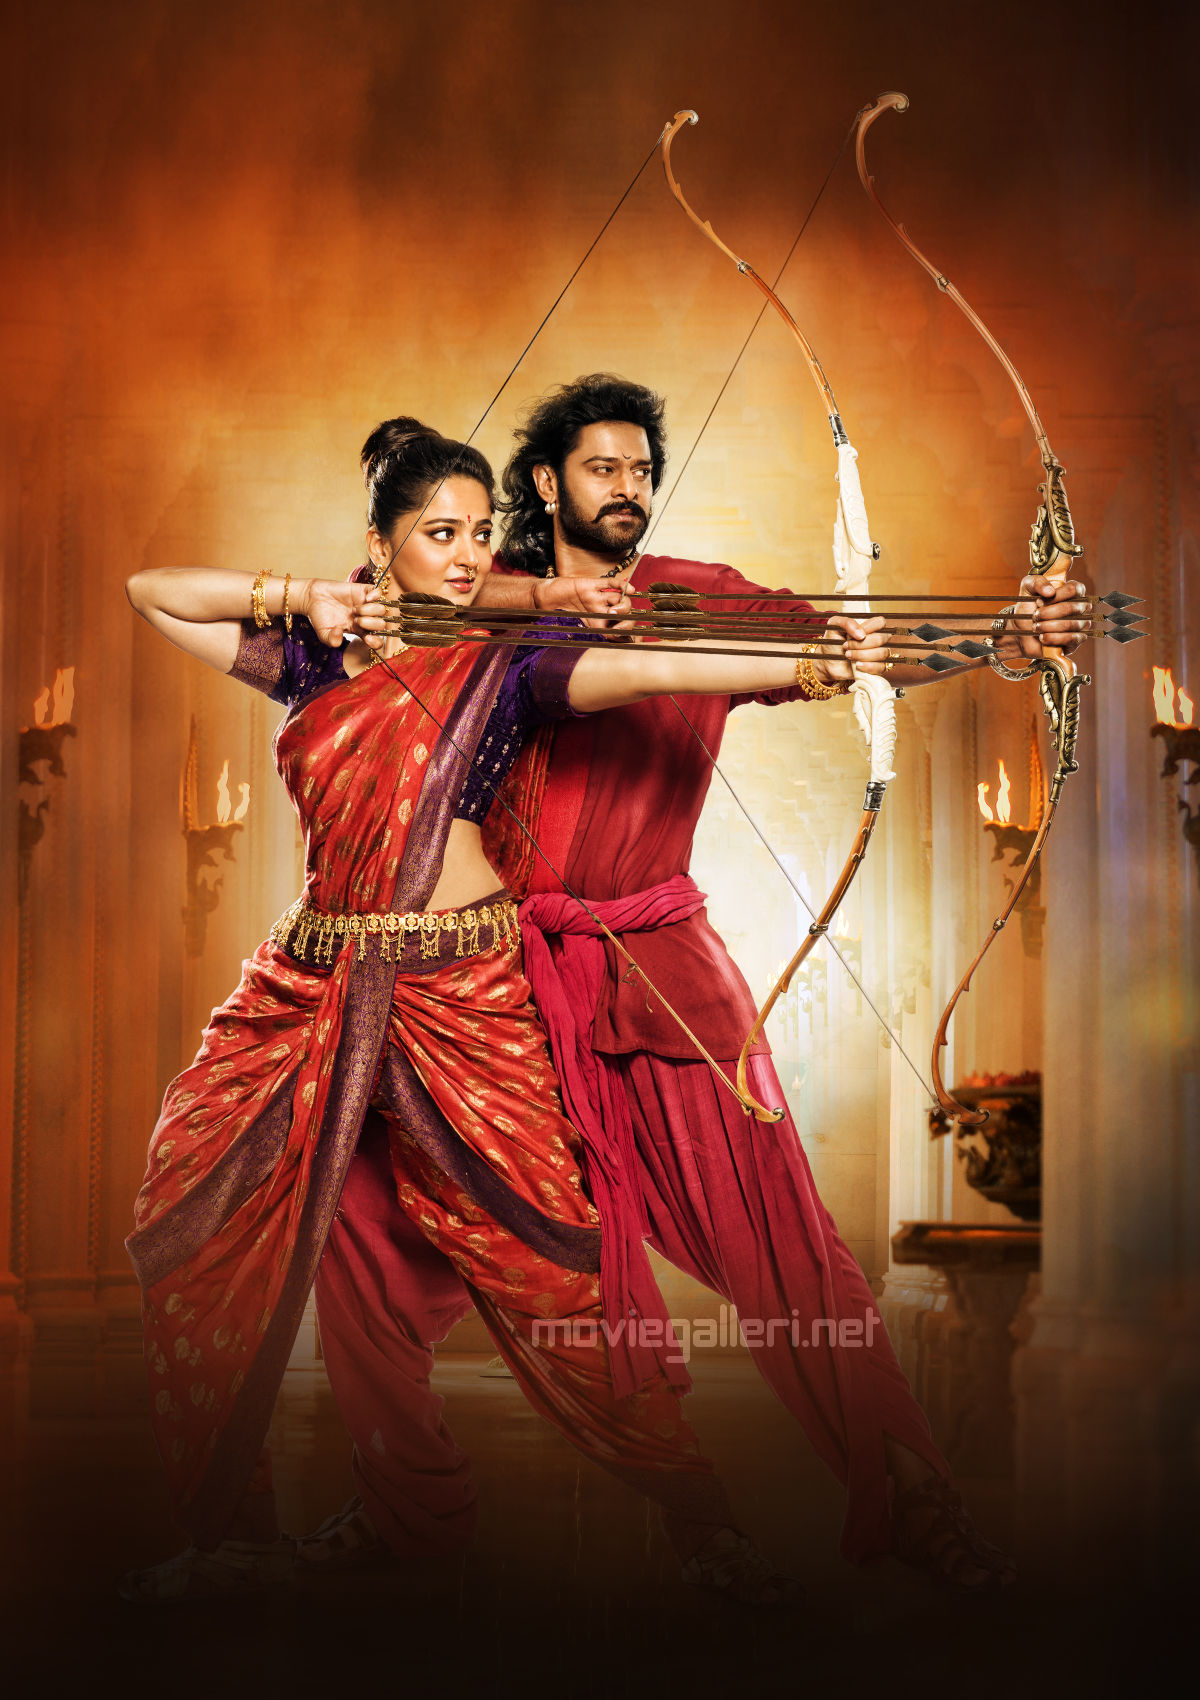 Anushka Shetty, Prabhas in Baahubali 2 Movie Stills